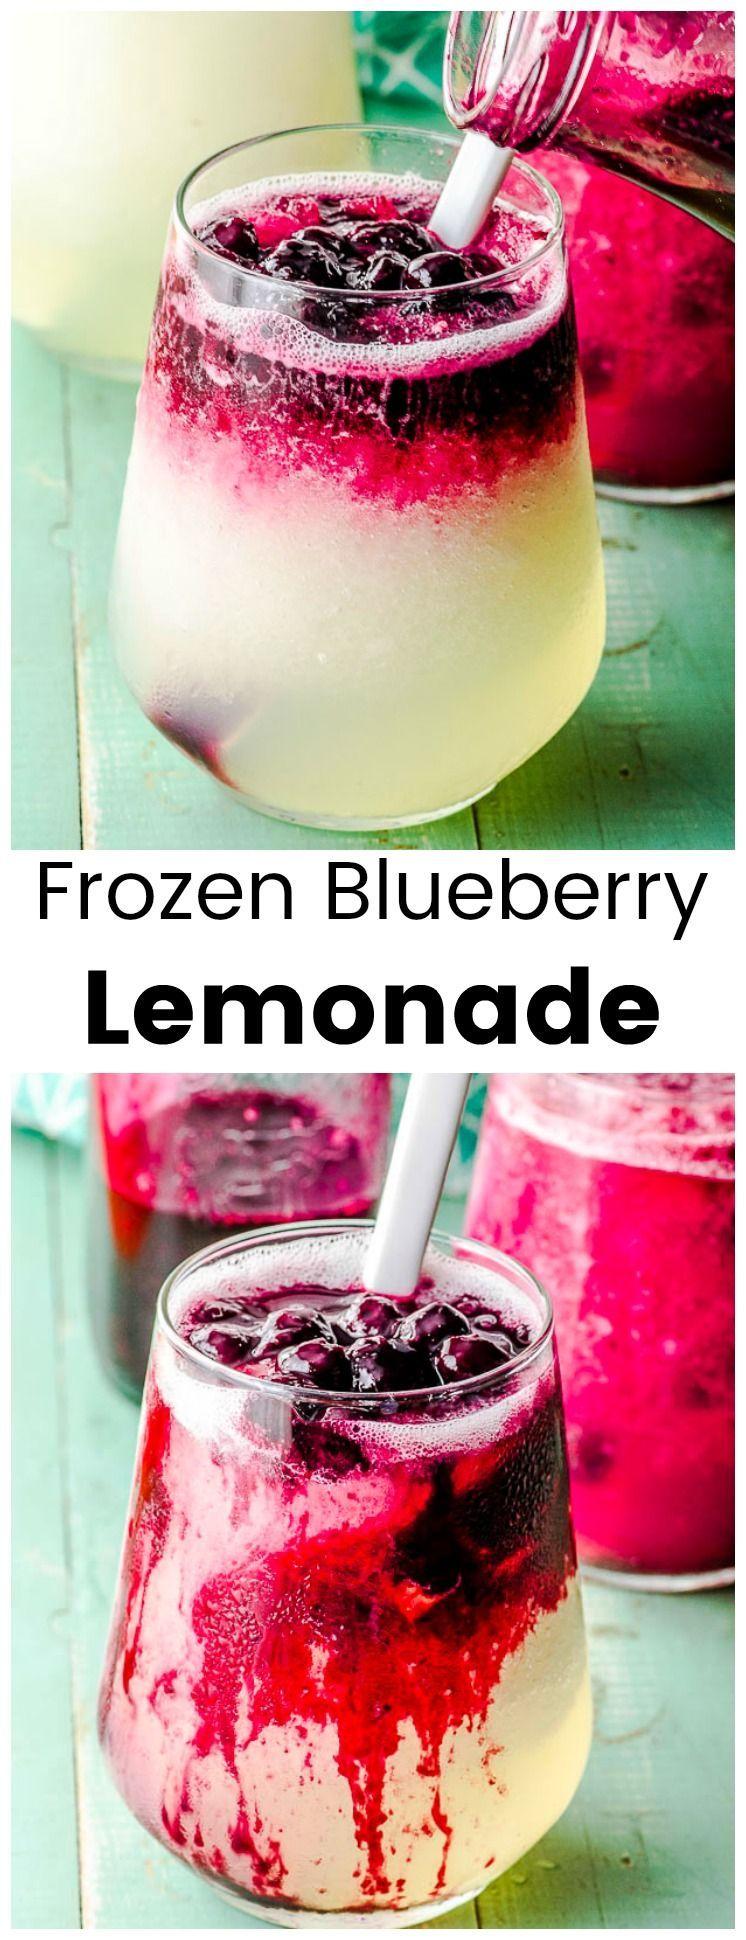 #blueberries #combination #refreshing #blueberry #delicious #lemonade #favorite #summer #become #lem...